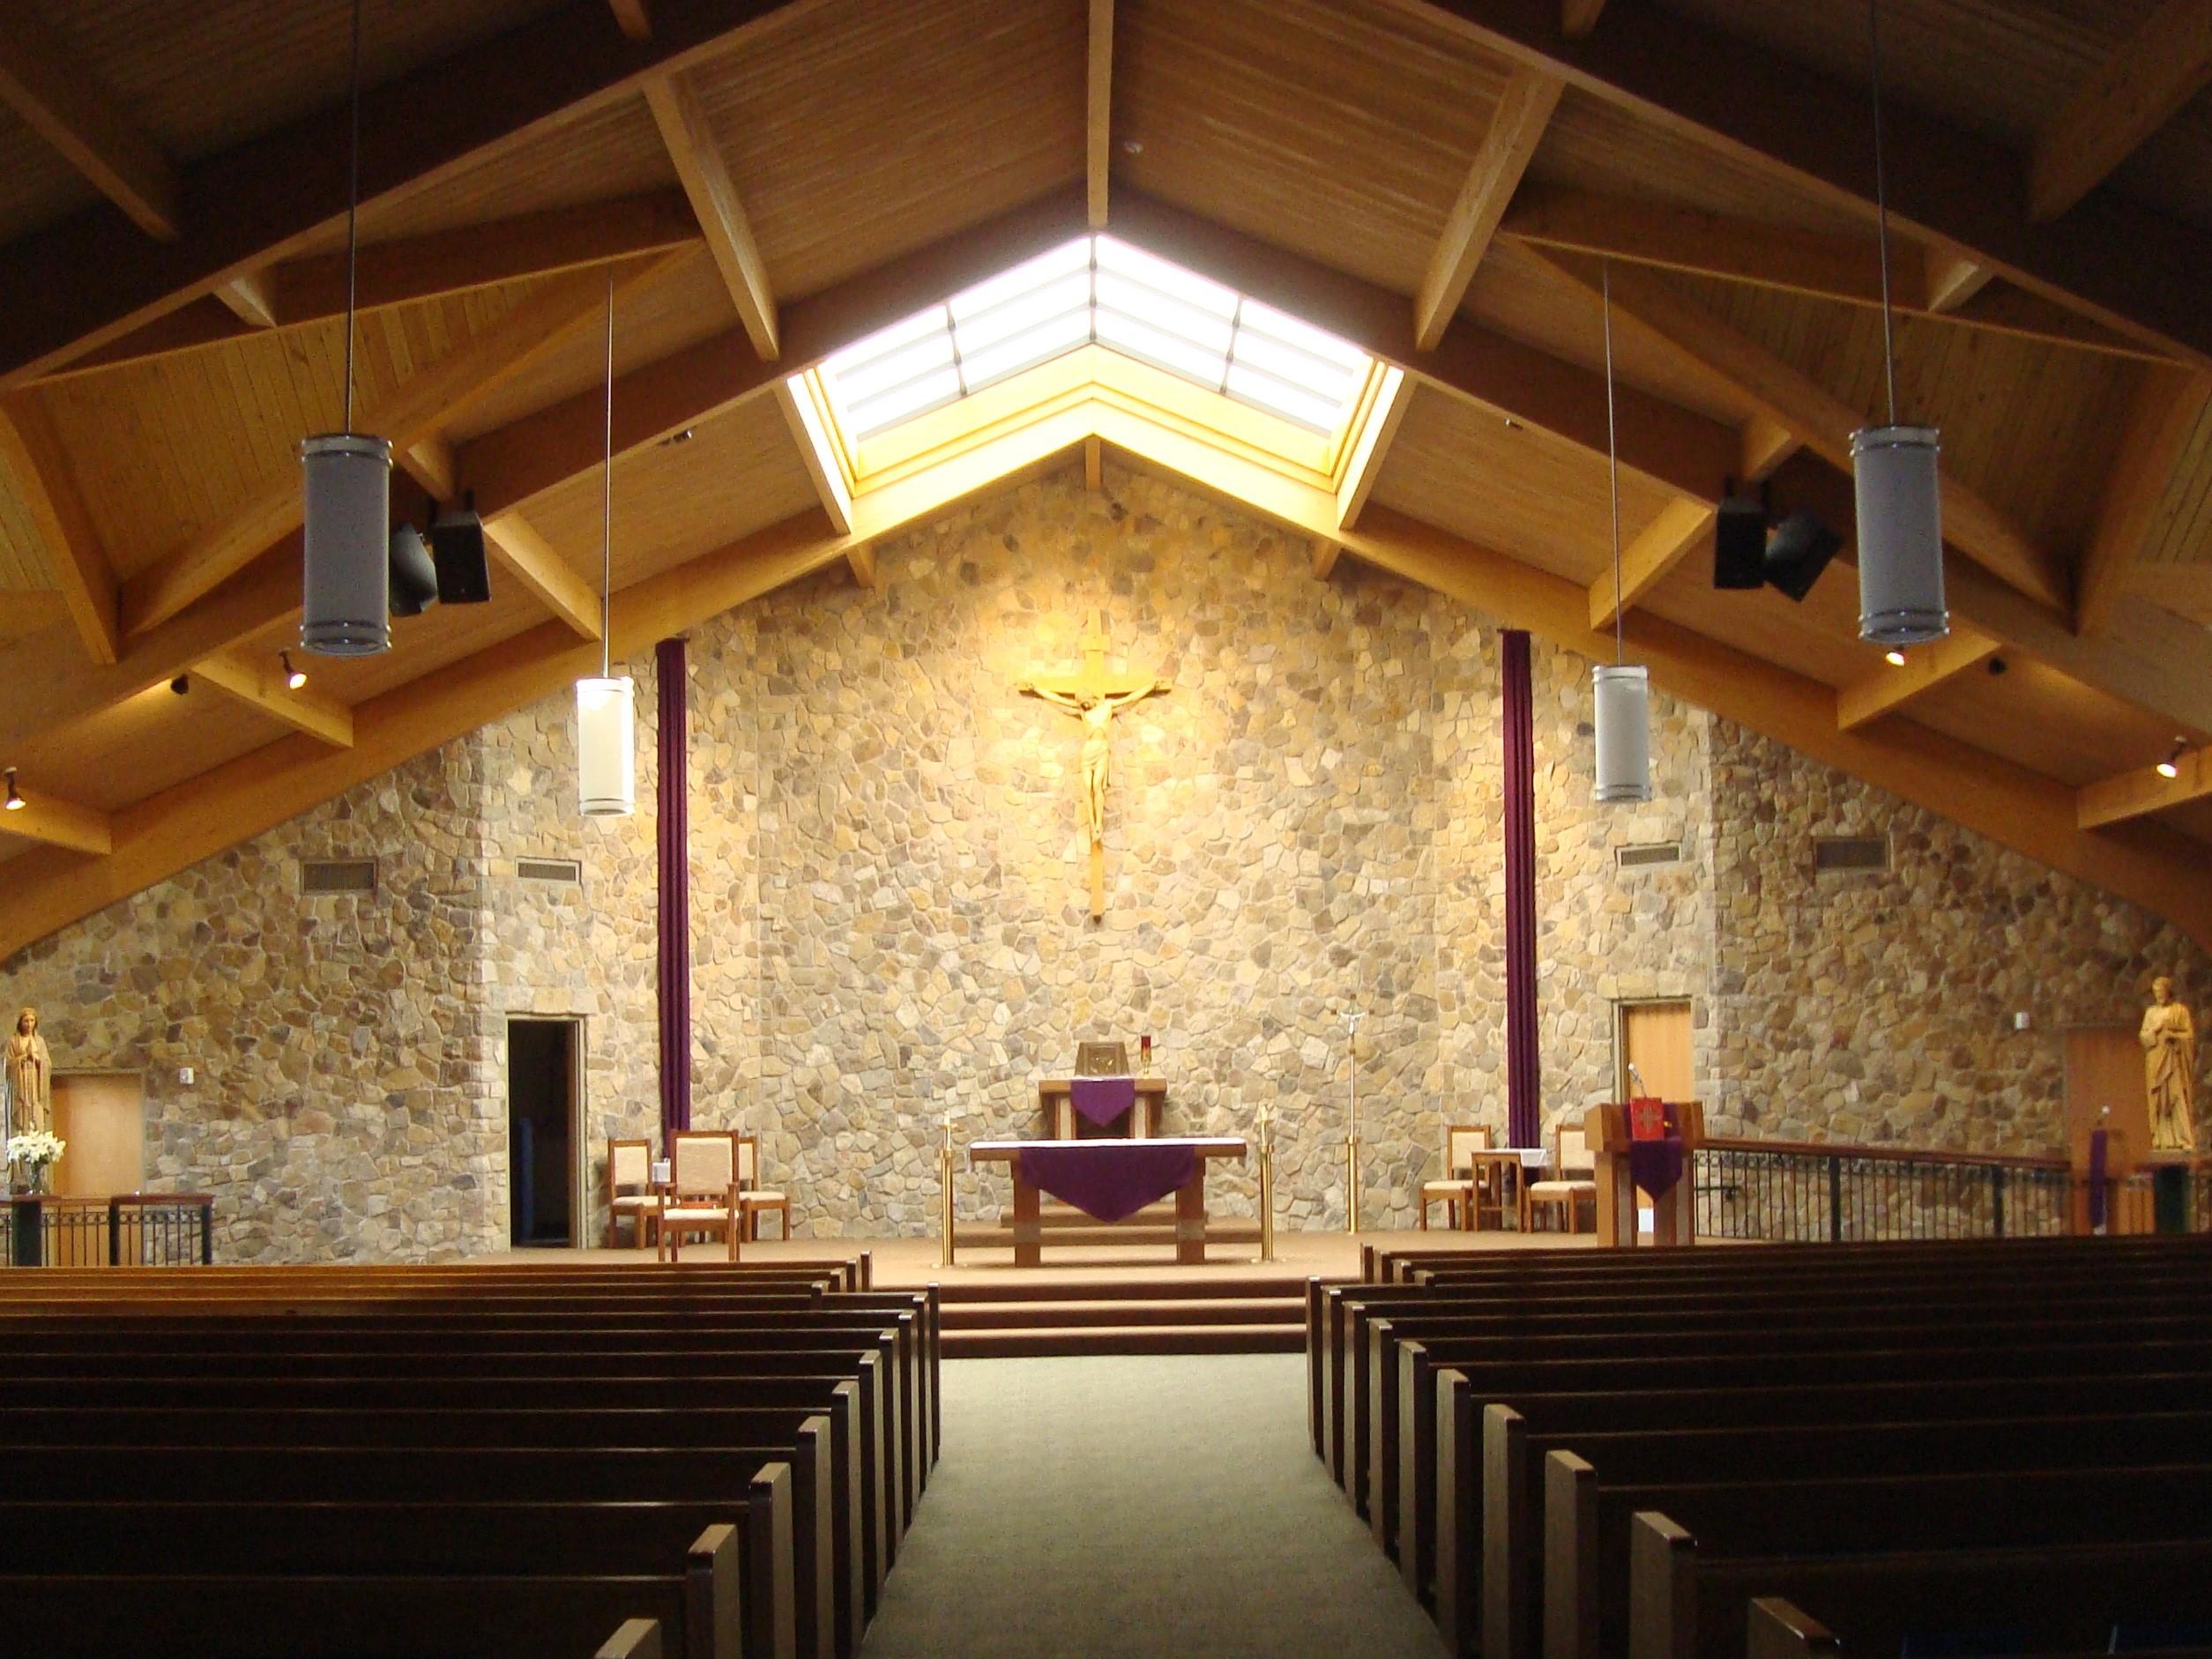 St. Thomas Moore Church